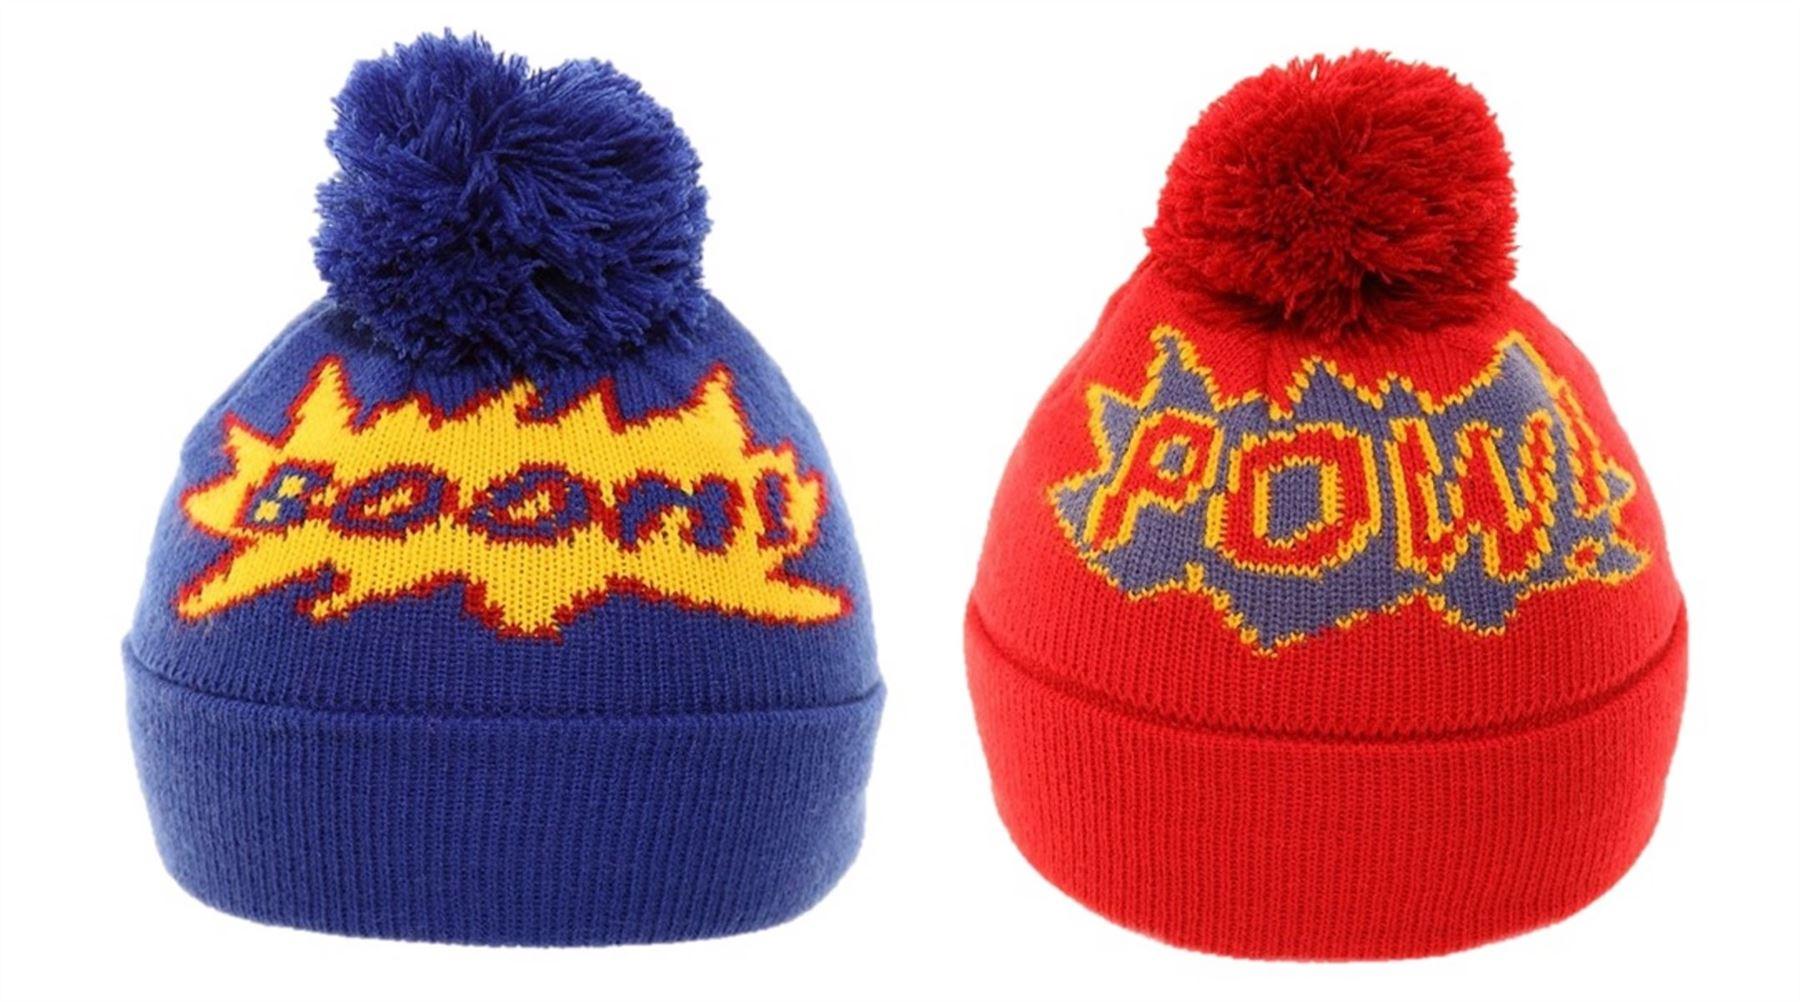 Boys Childrens Winter Hat Novelty Beanie Warm Comfy Comic  c84ba2e2962